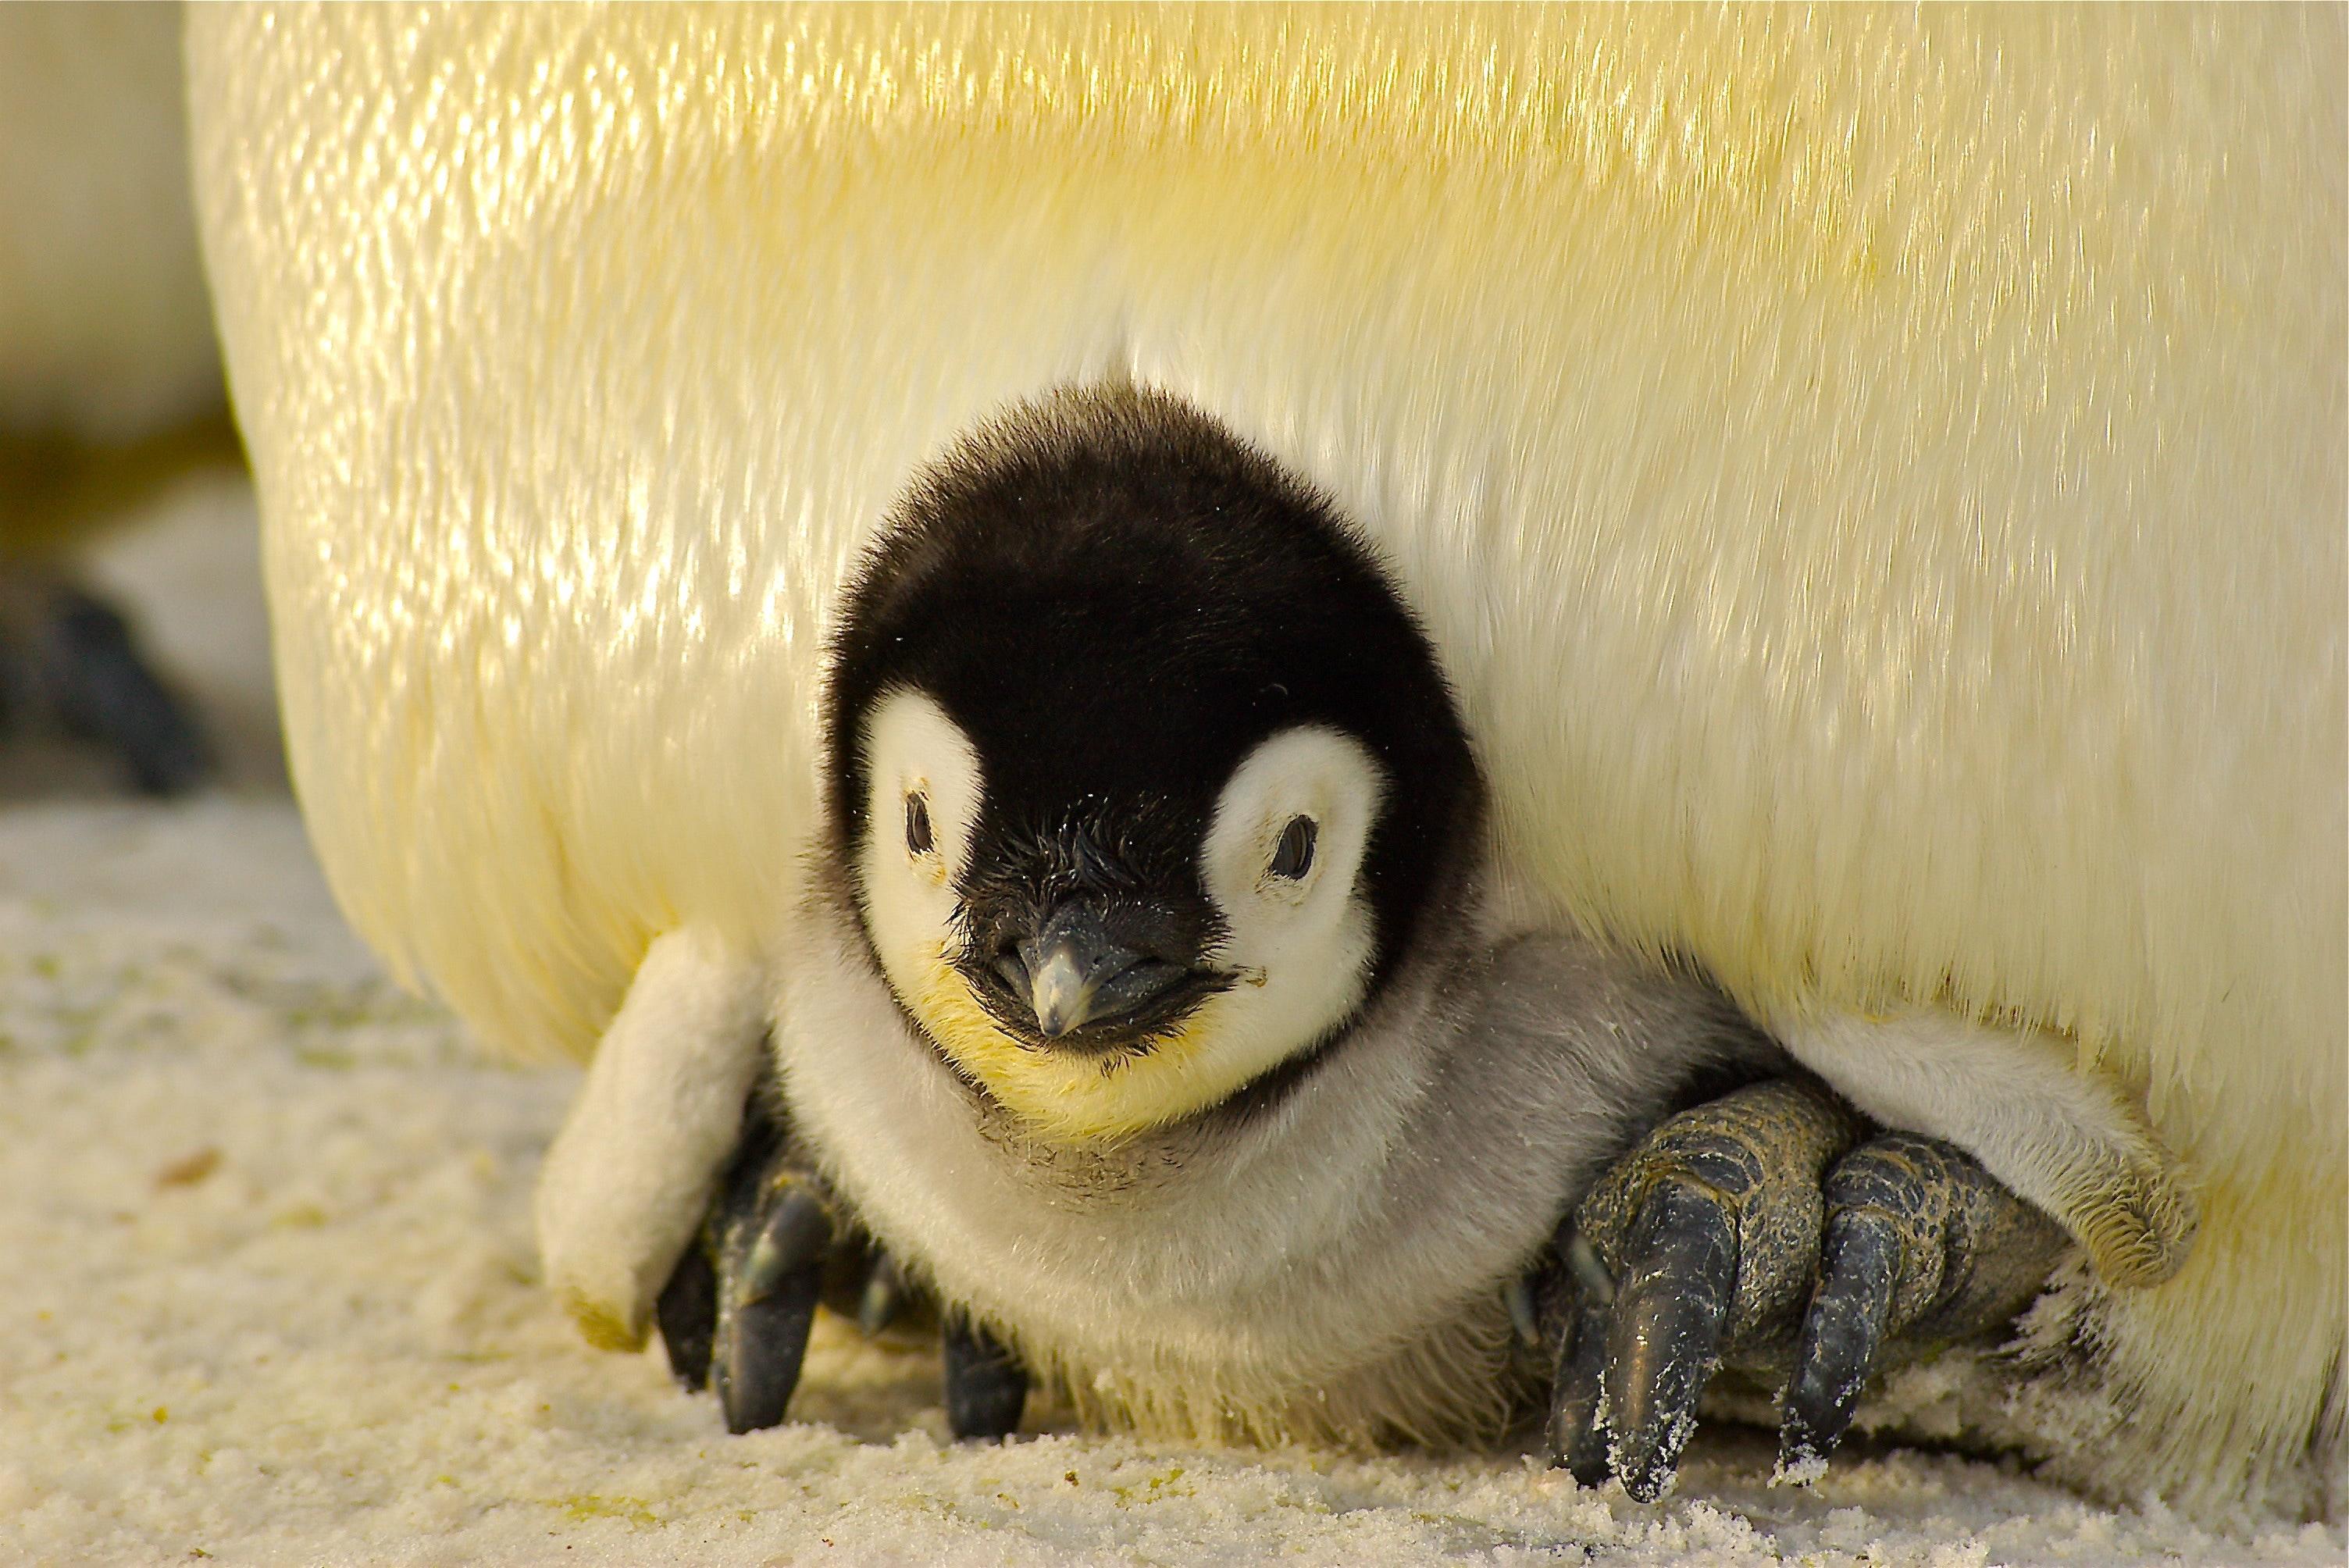 pingvin, penguin, unge, kid, zoo